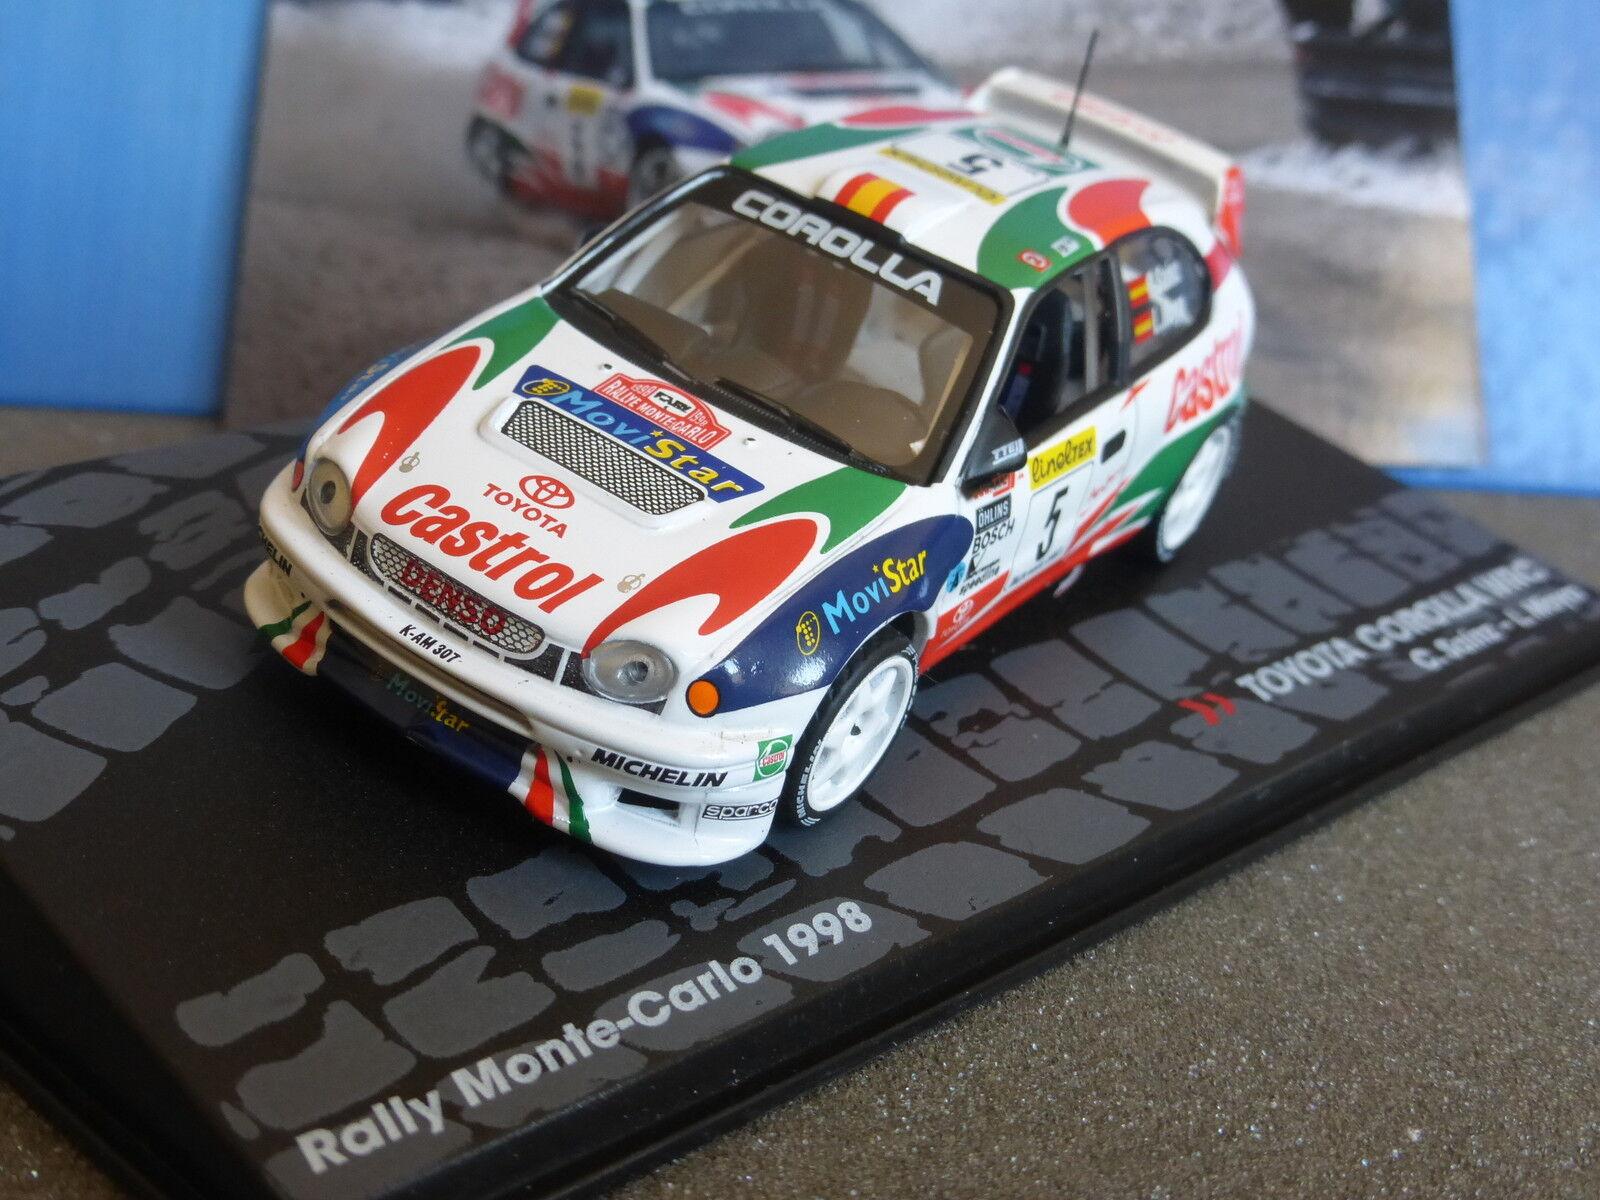 TOYOTA TOYOTA TOYOTA CgoldLLA WRC RALLYE MONTE CARLO 1998 SAINZ MOYA 1 43 CASTROL MOVISTAR bc99d8